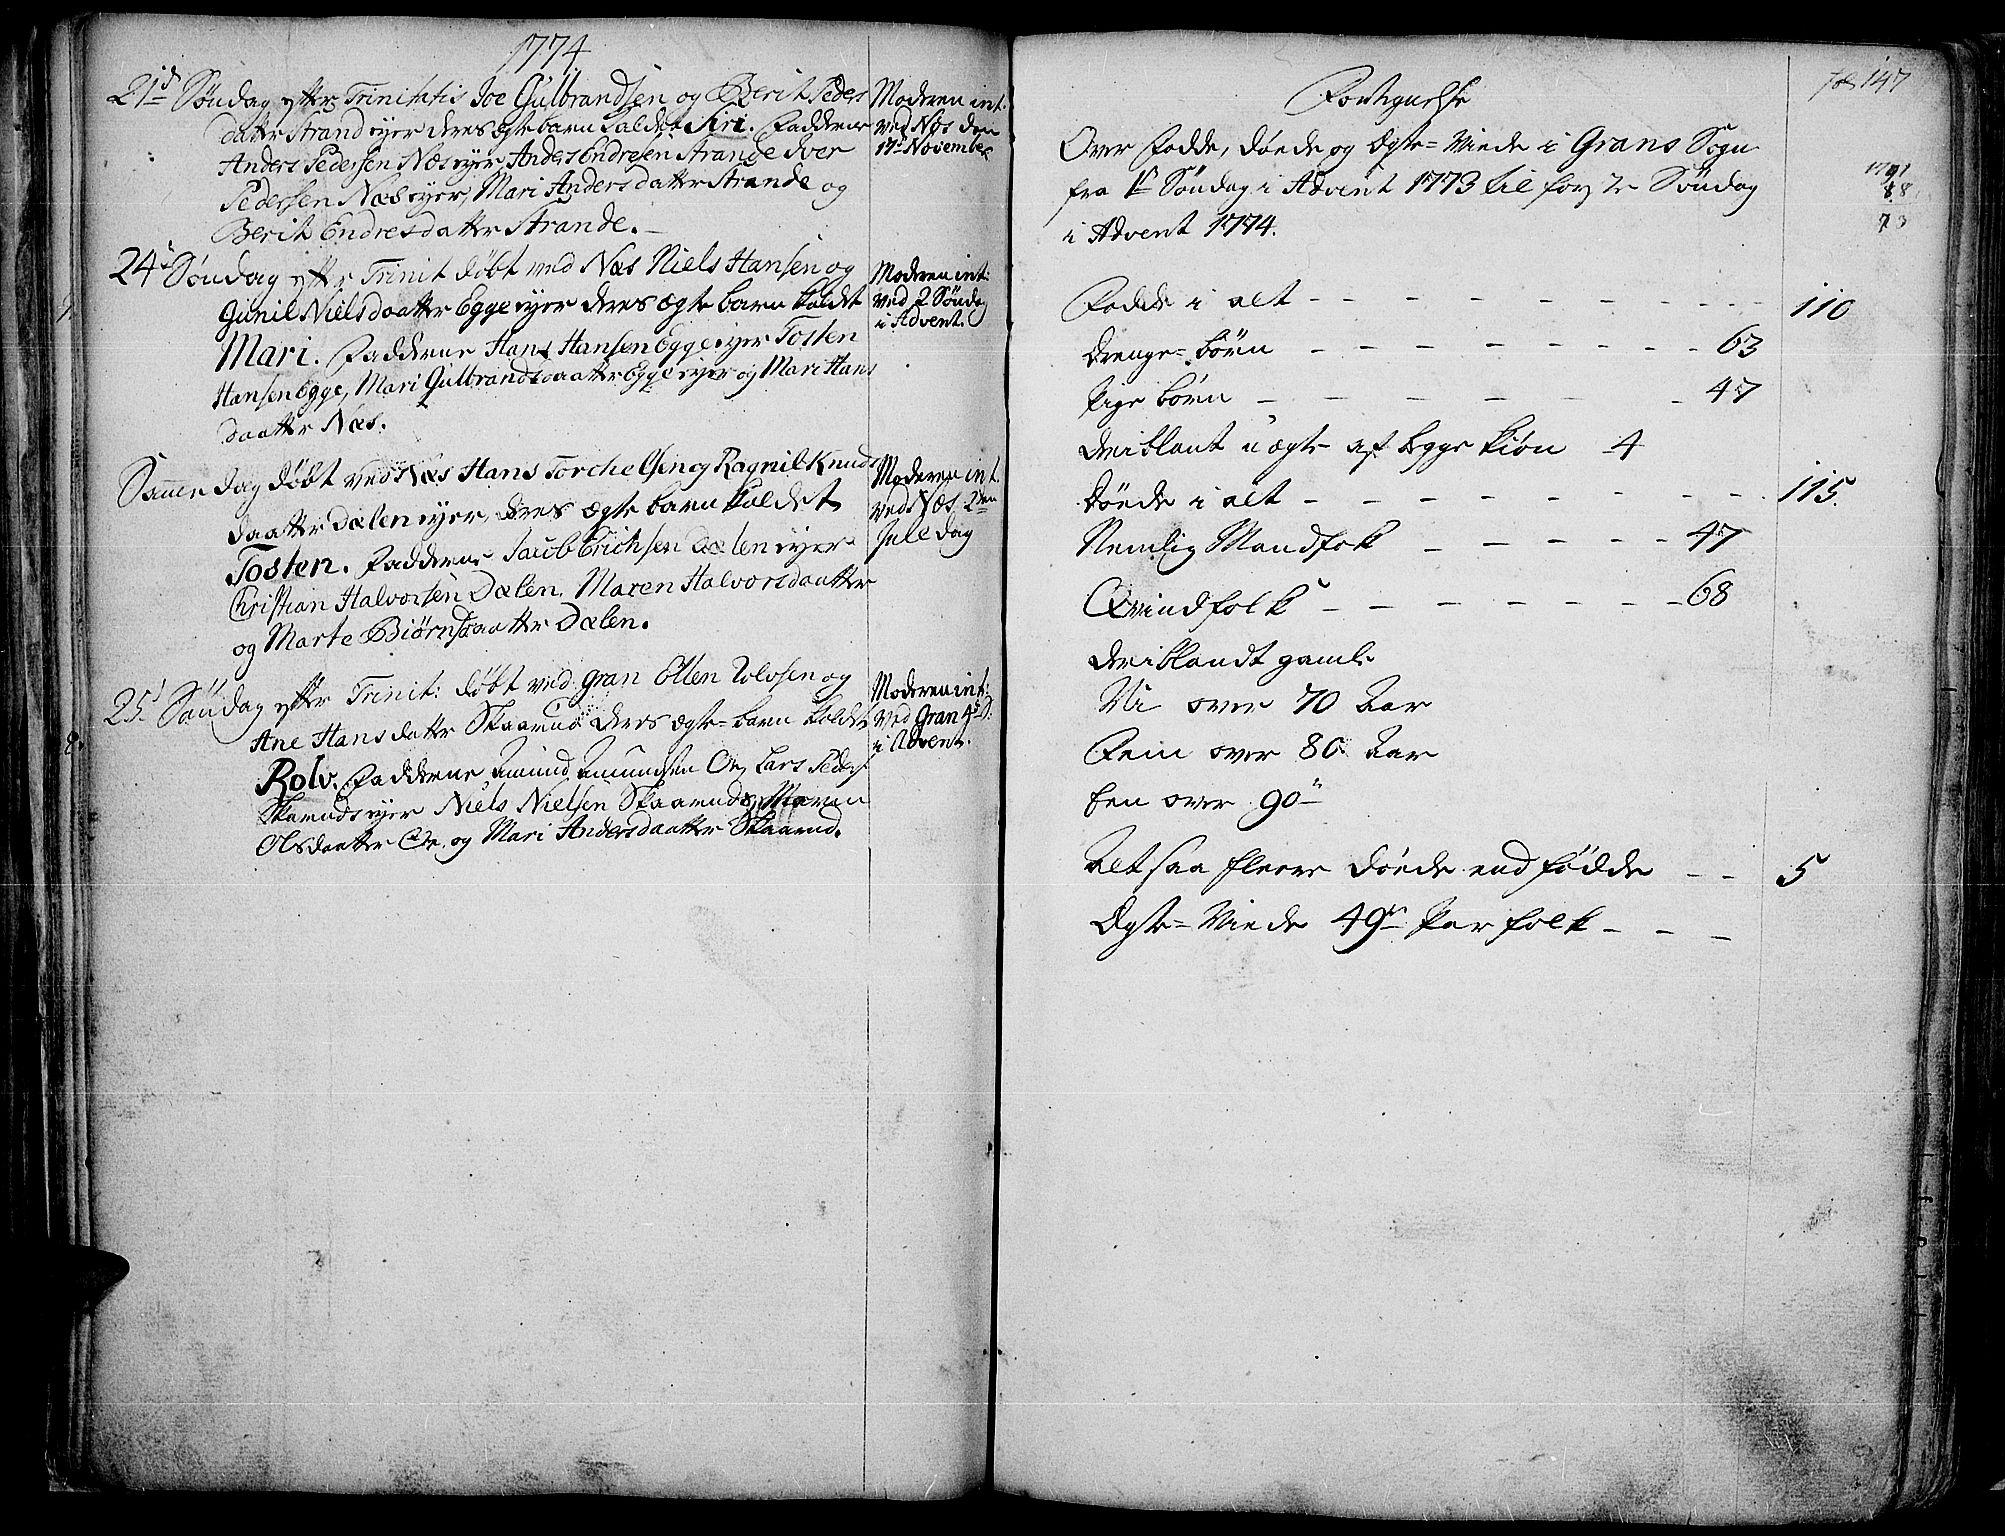 SAH, Gran prestekontor, Ministerialbok nr. 4, 1759-1775, s. 147